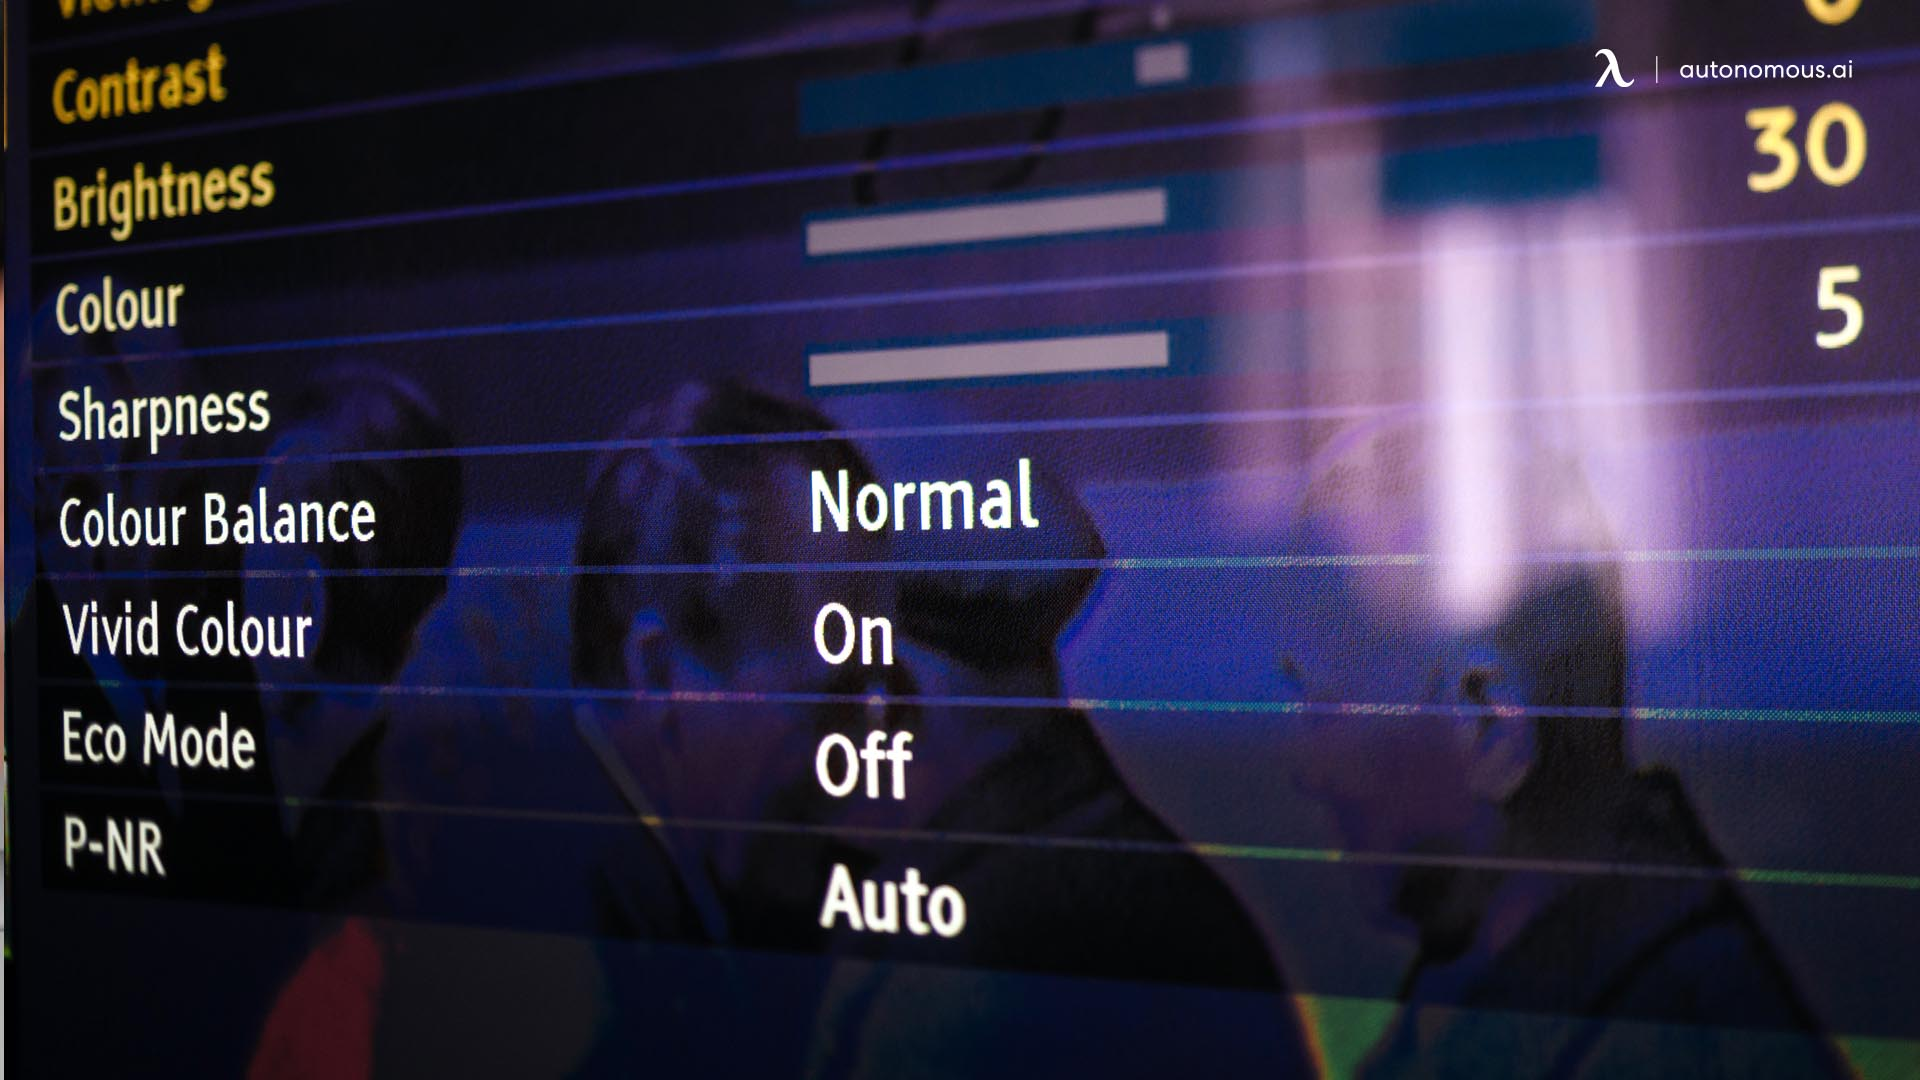 adjust the display settings on your computer